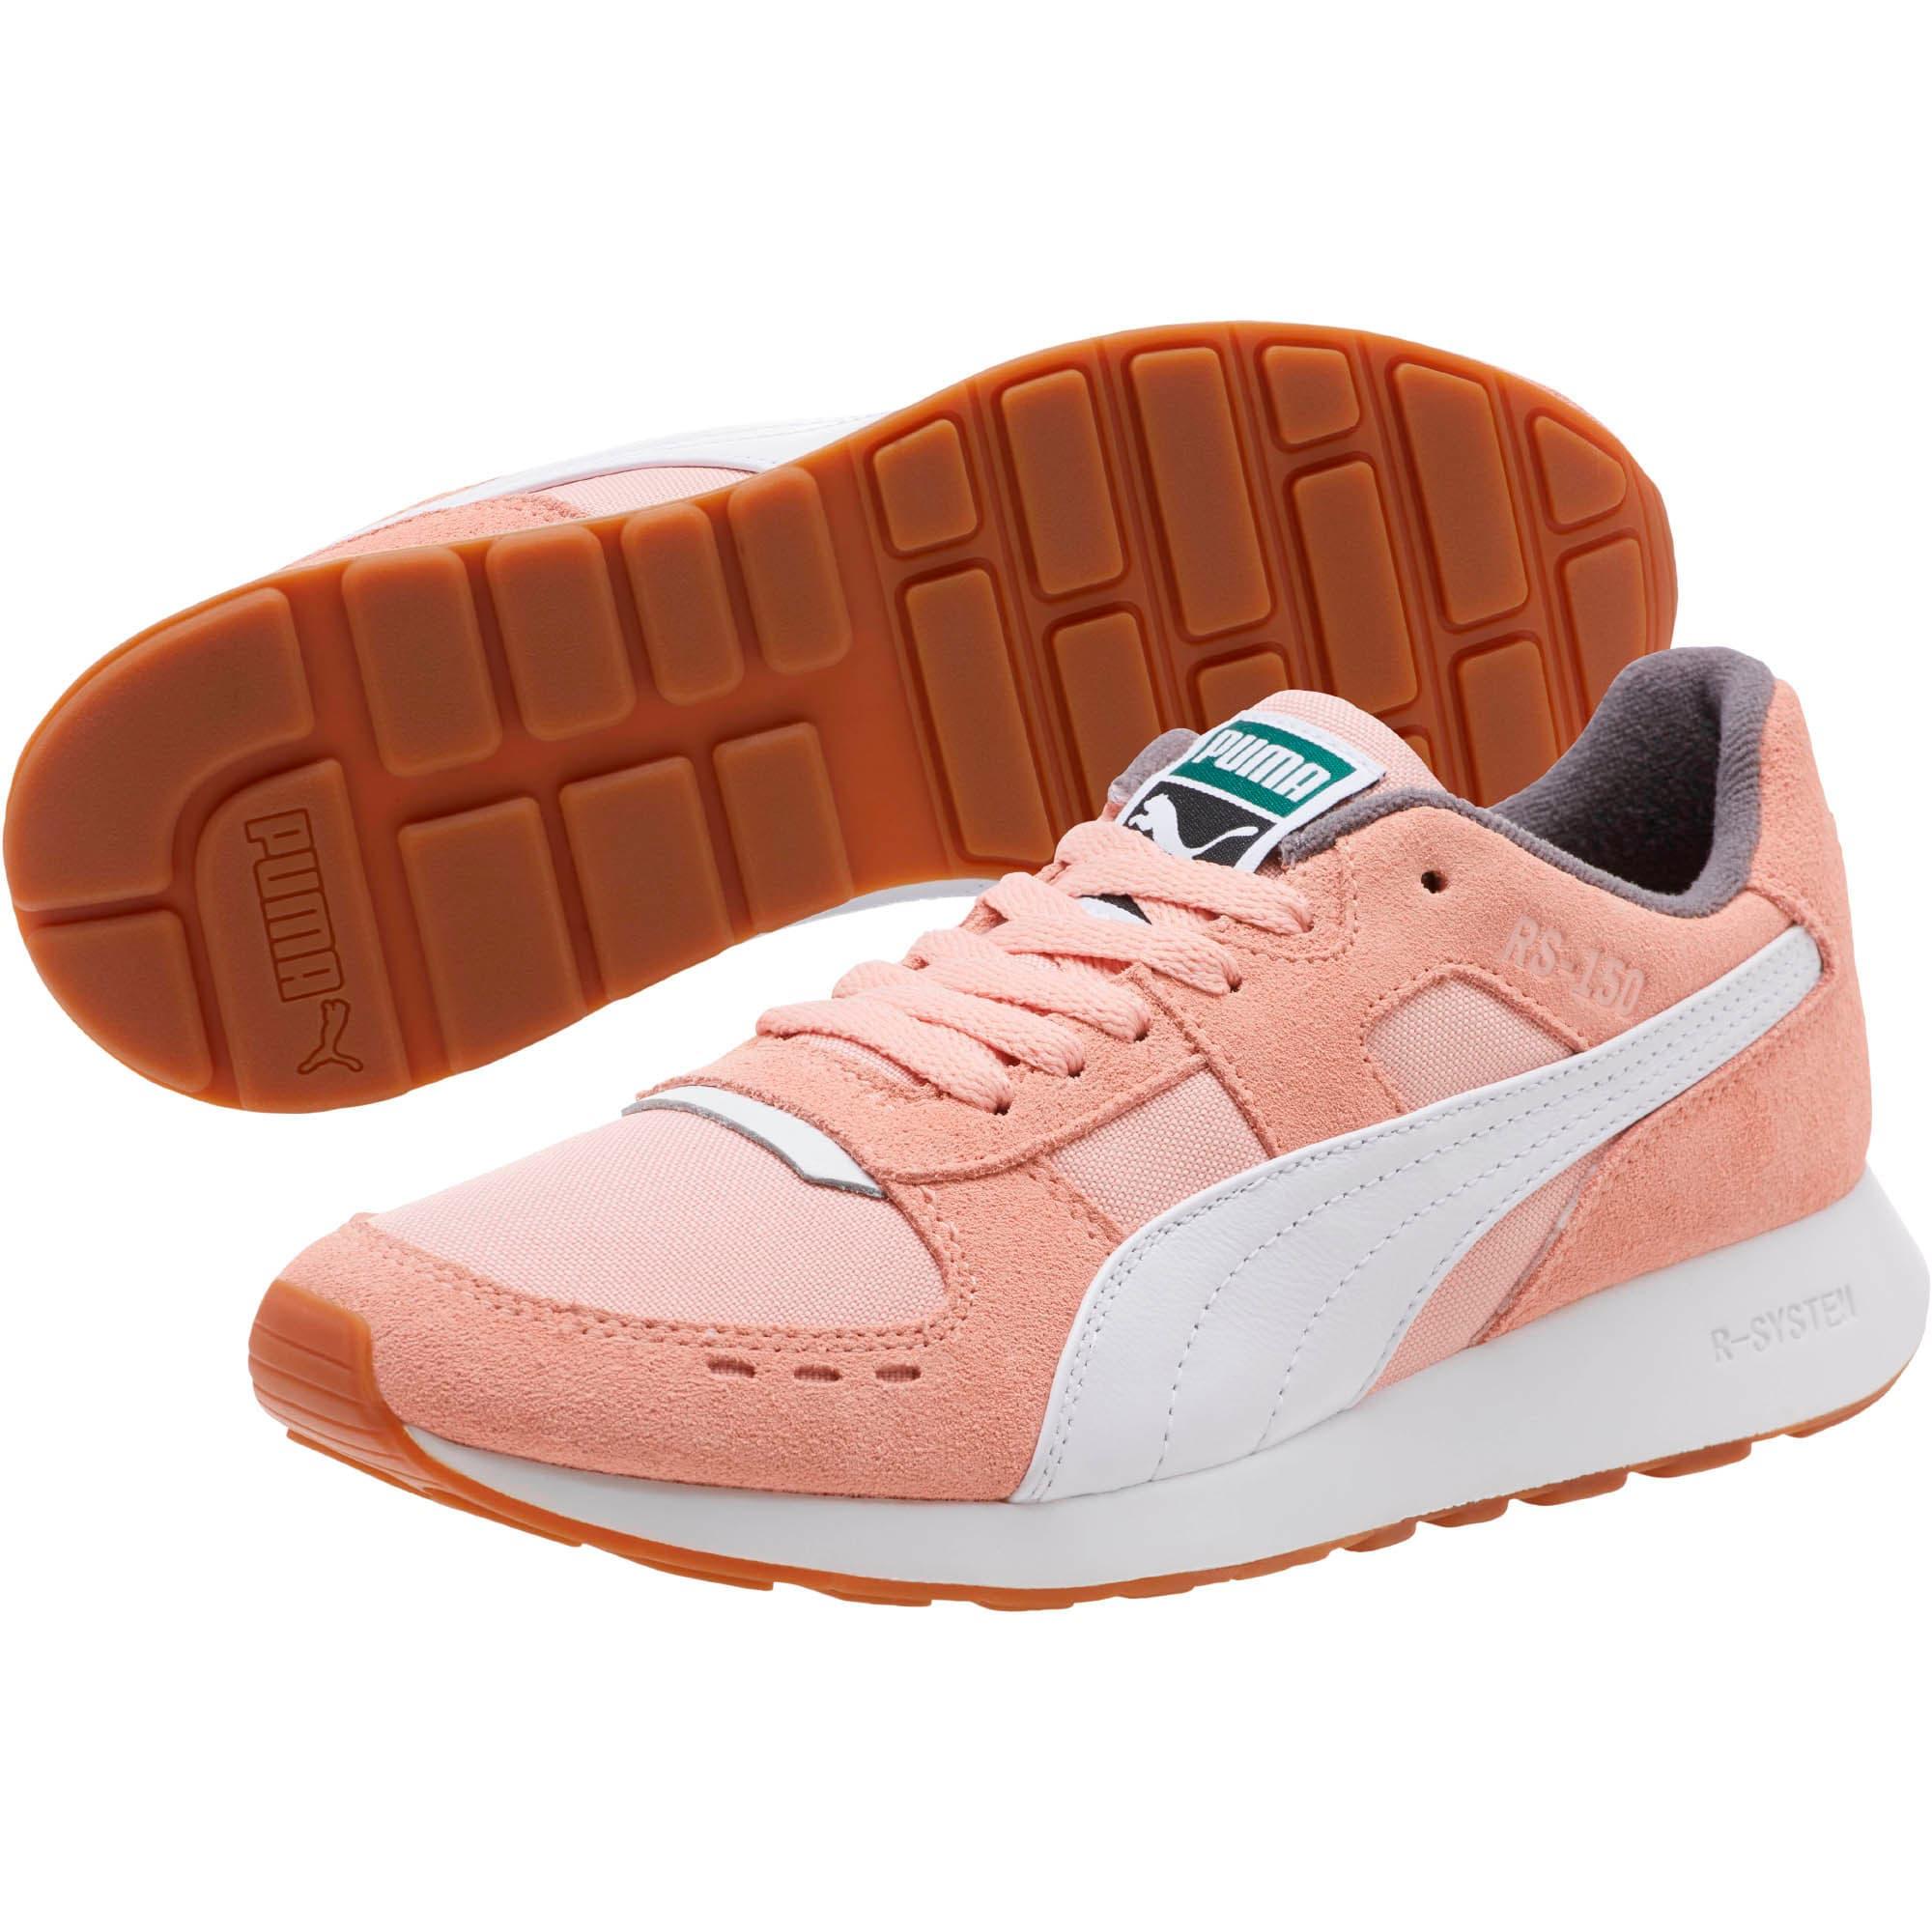 Thumbnail 2 of RS-150 Nylon Women's Sneakers, Coral Cloud-Puma White, medium